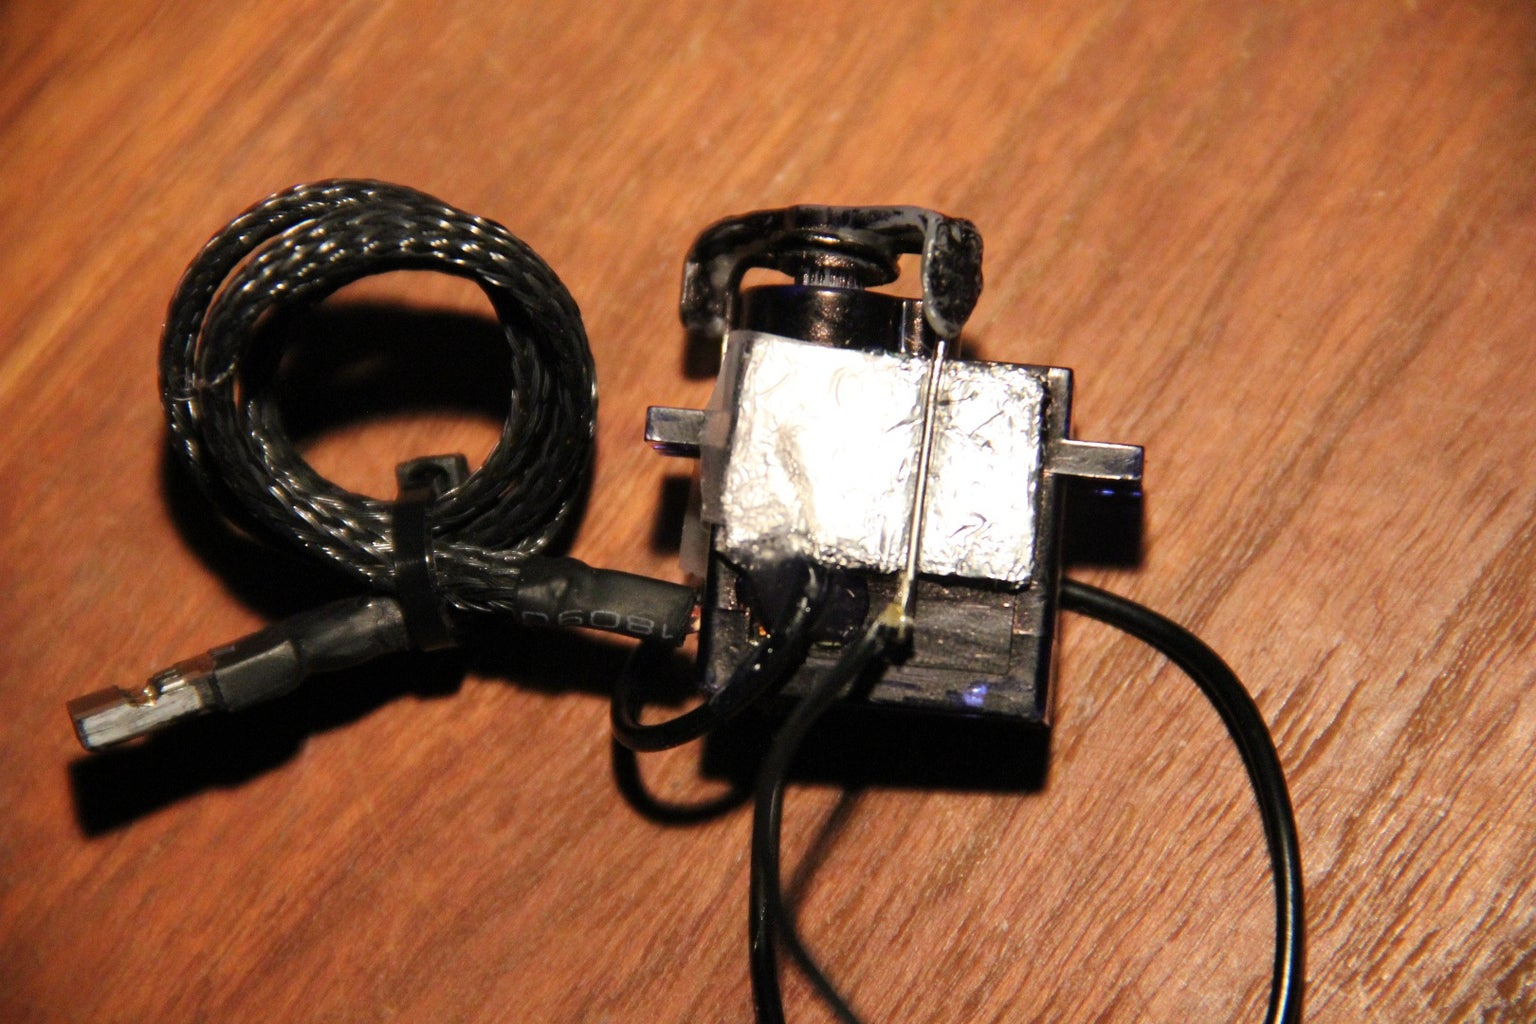 Preparing the Switch Servo Part 3